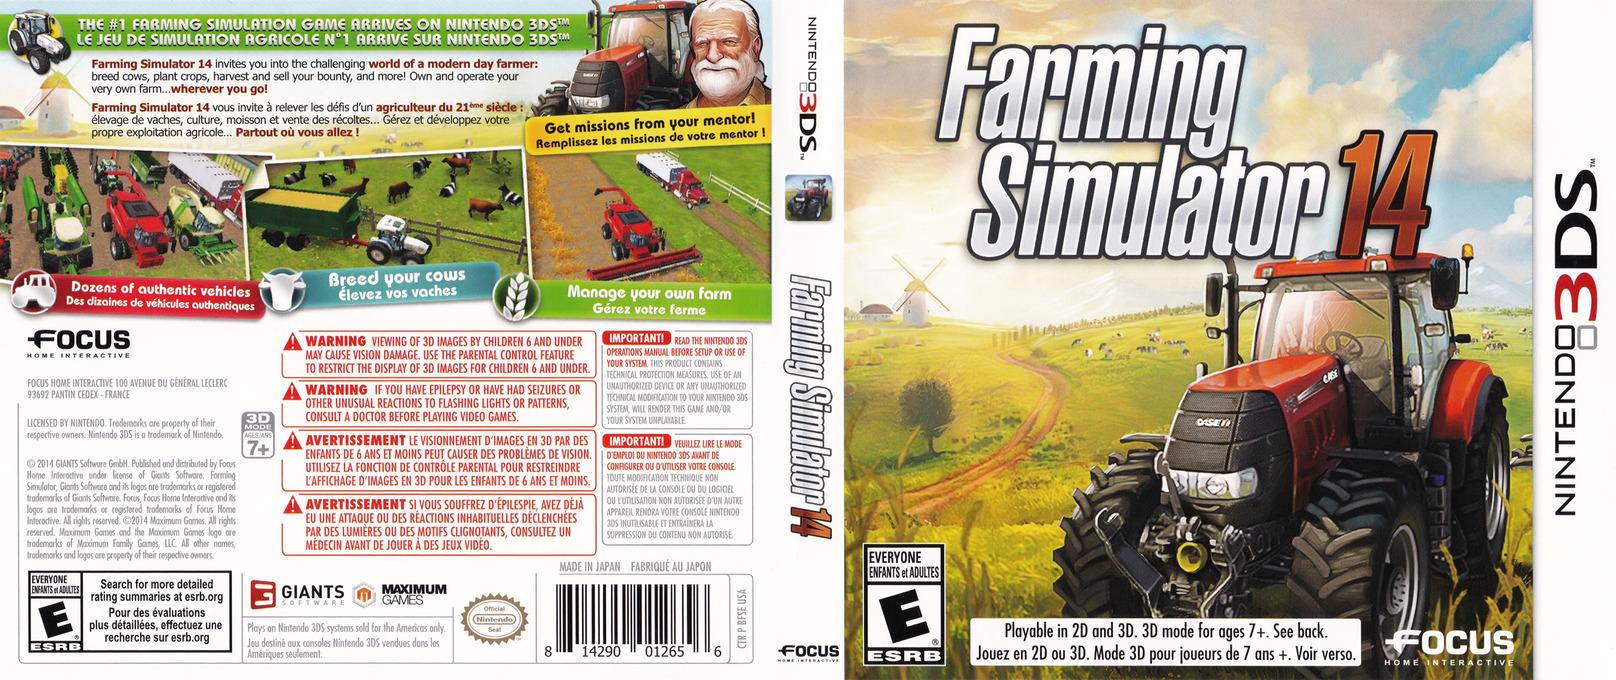 Farming Simulator 14 3DS coverfullHQ (BFSE)